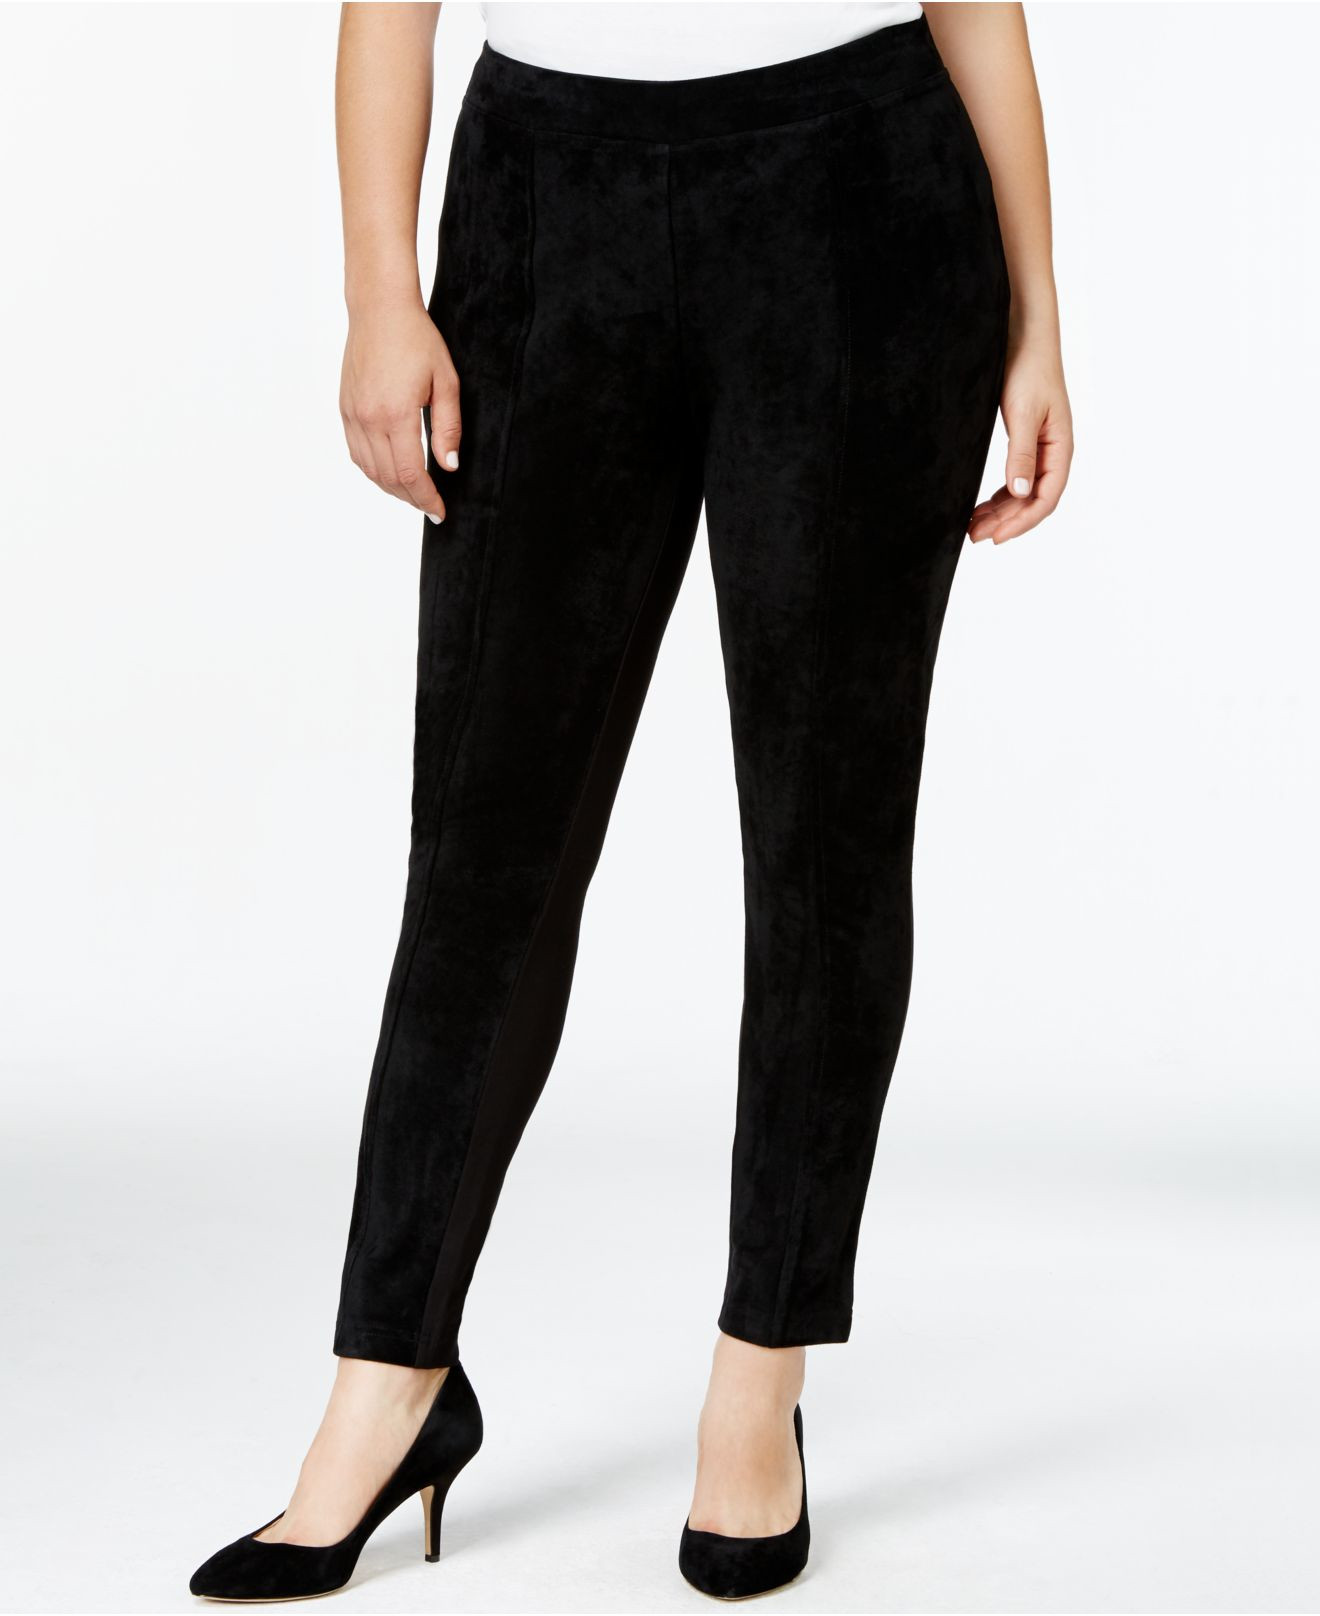 calvin klein plus size faux suede front leggings in black lyst. Black Bedroom Furniture Sets. Home Design Ideas